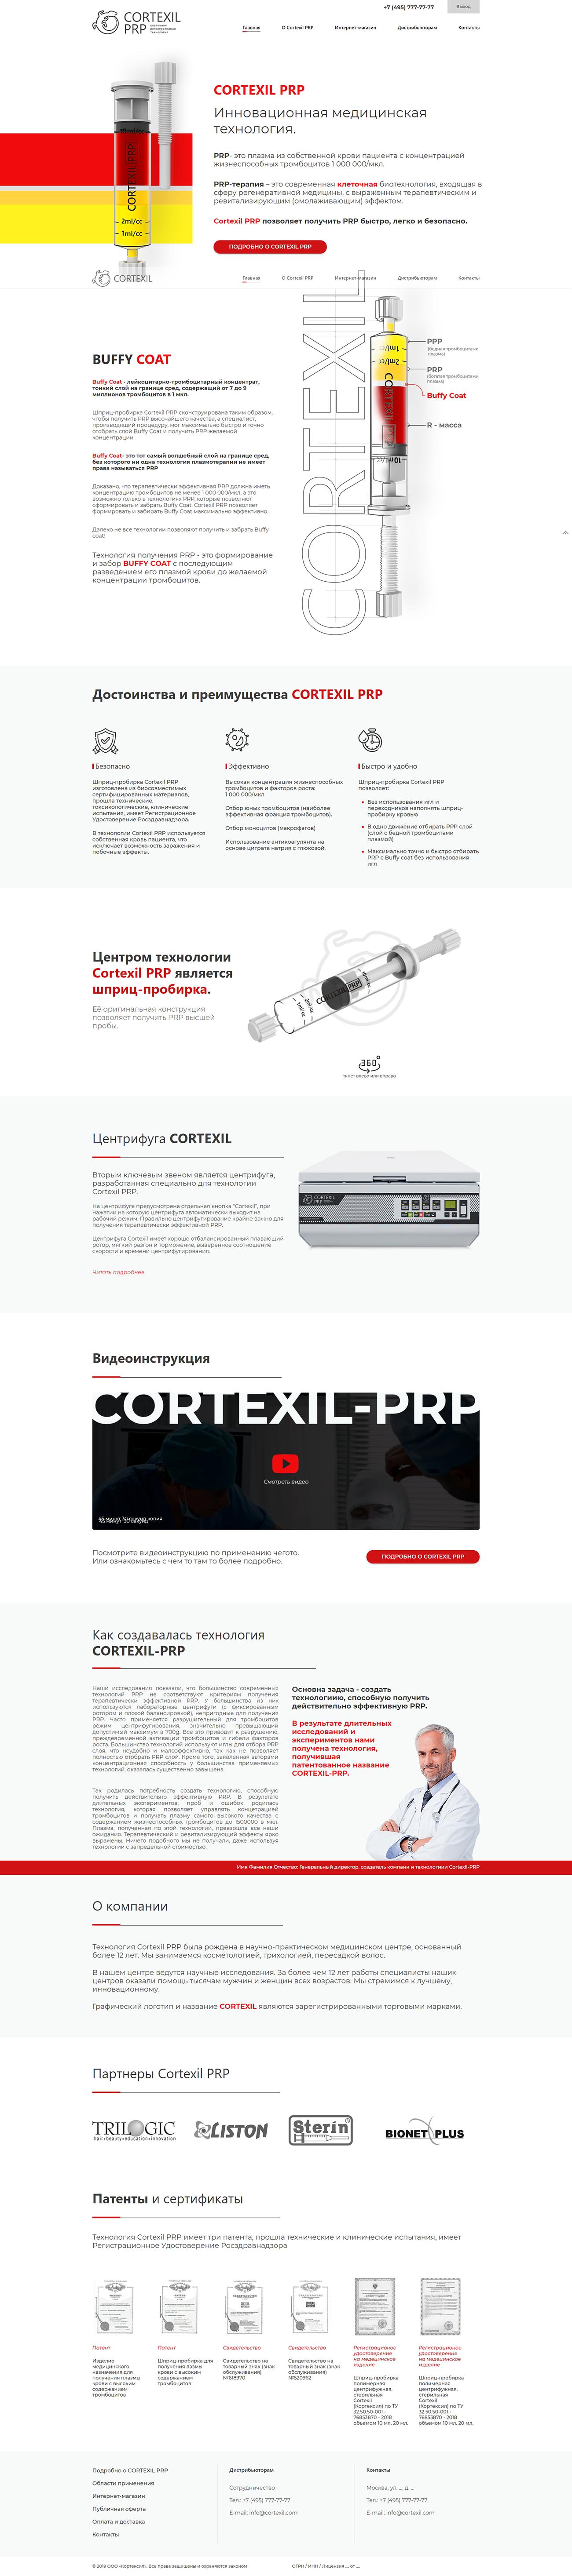 CORTEXIL PRP